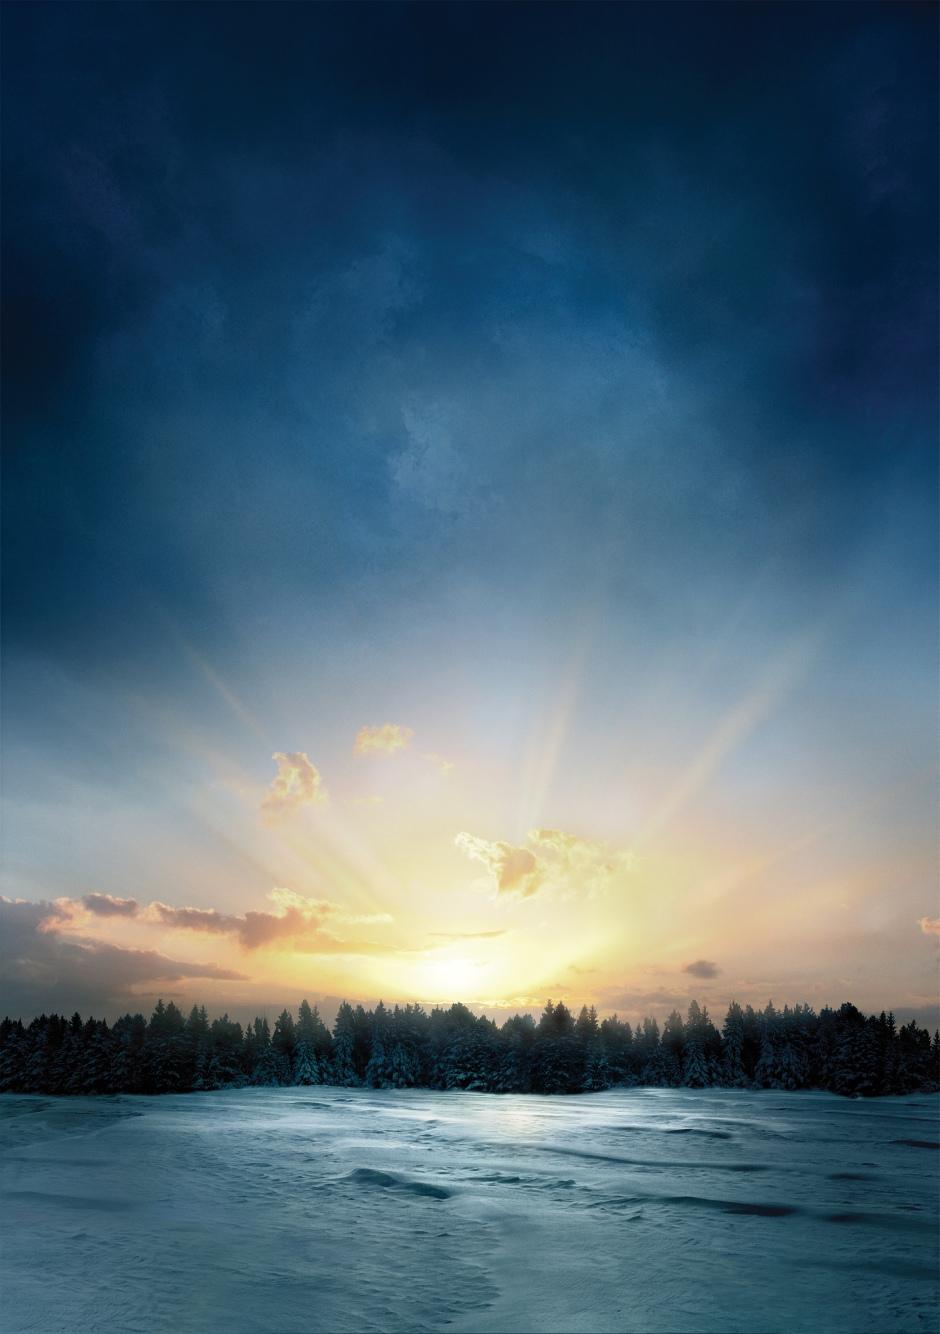 The-Twilight-Saga-Breaking-Dawn-Part-2-5